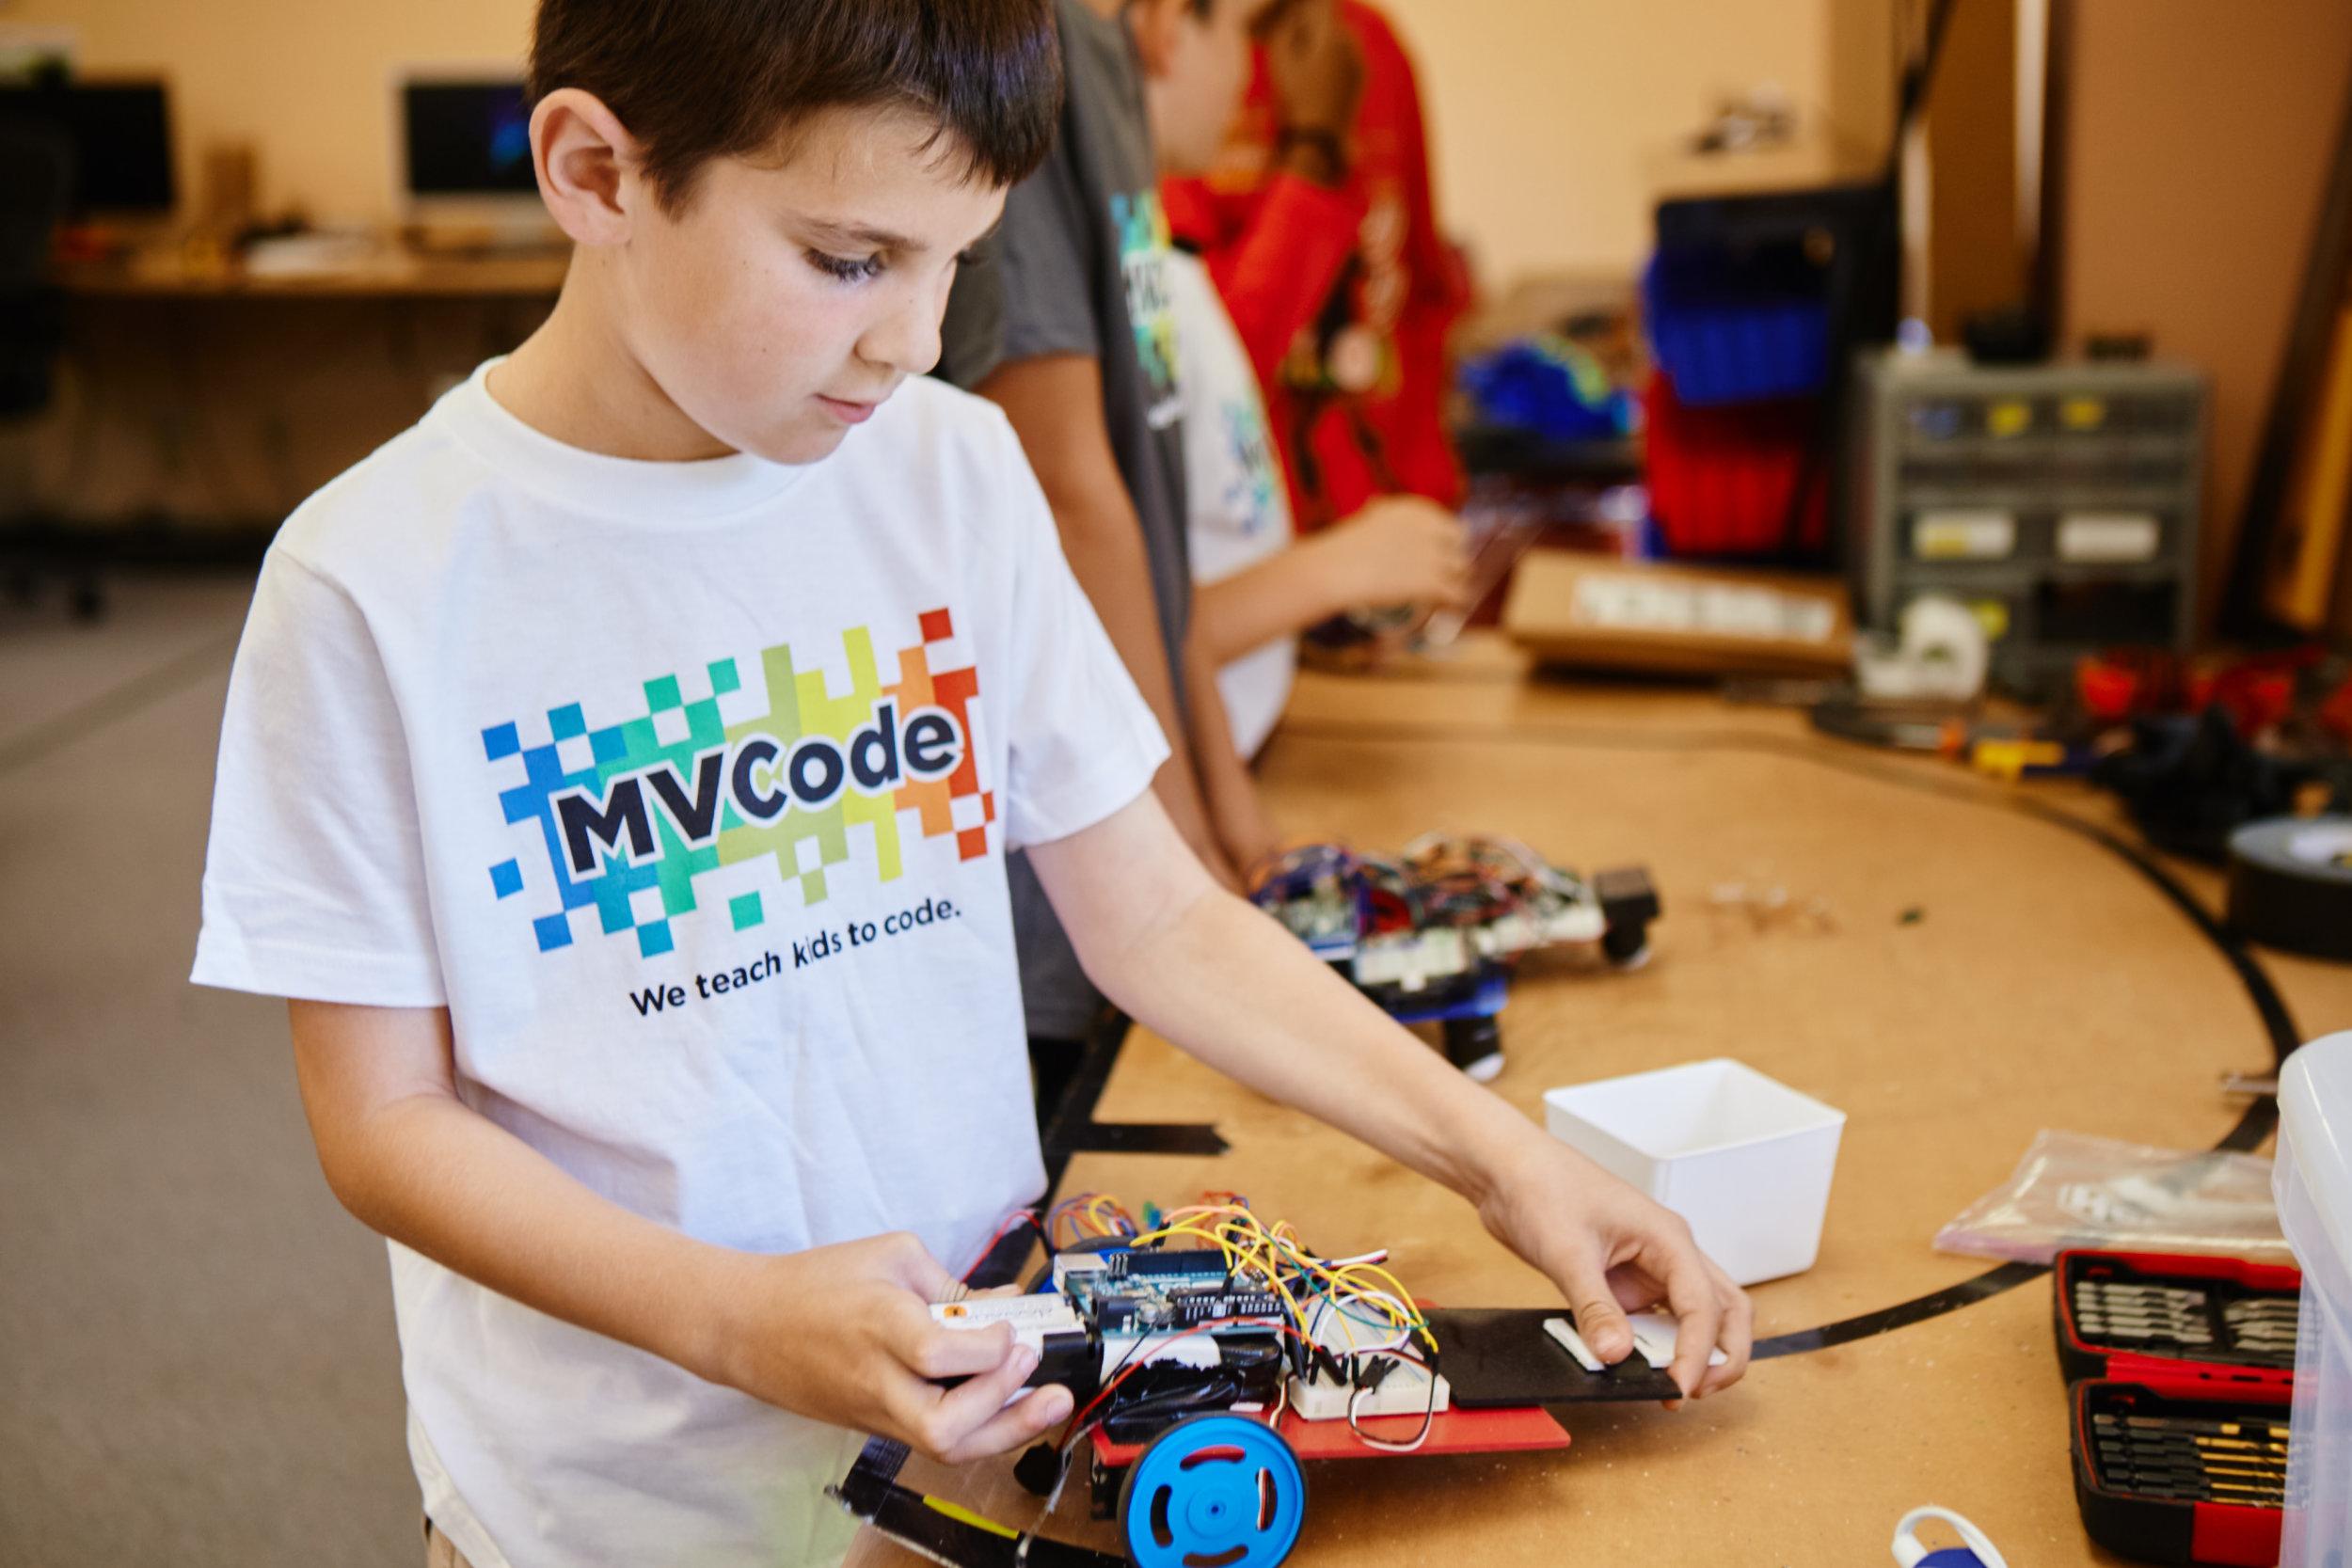 Robotics - Build & Code your own Arduino Robot